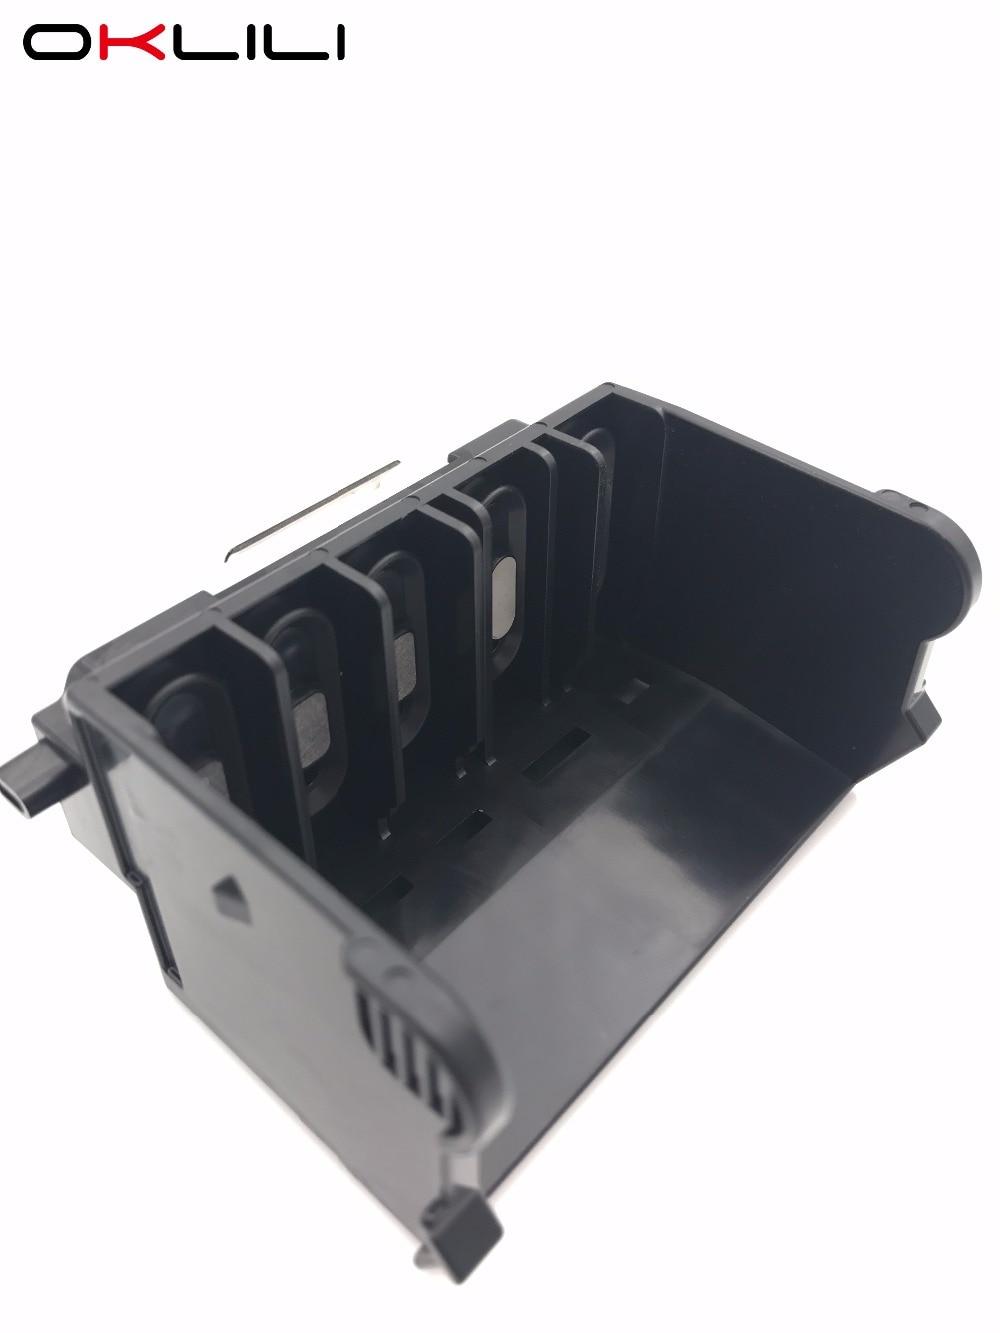 17t-3200 17 3000 17-2000 BIOS CHIP HP ENVY 17-3200 15-3000 Series 15-3200